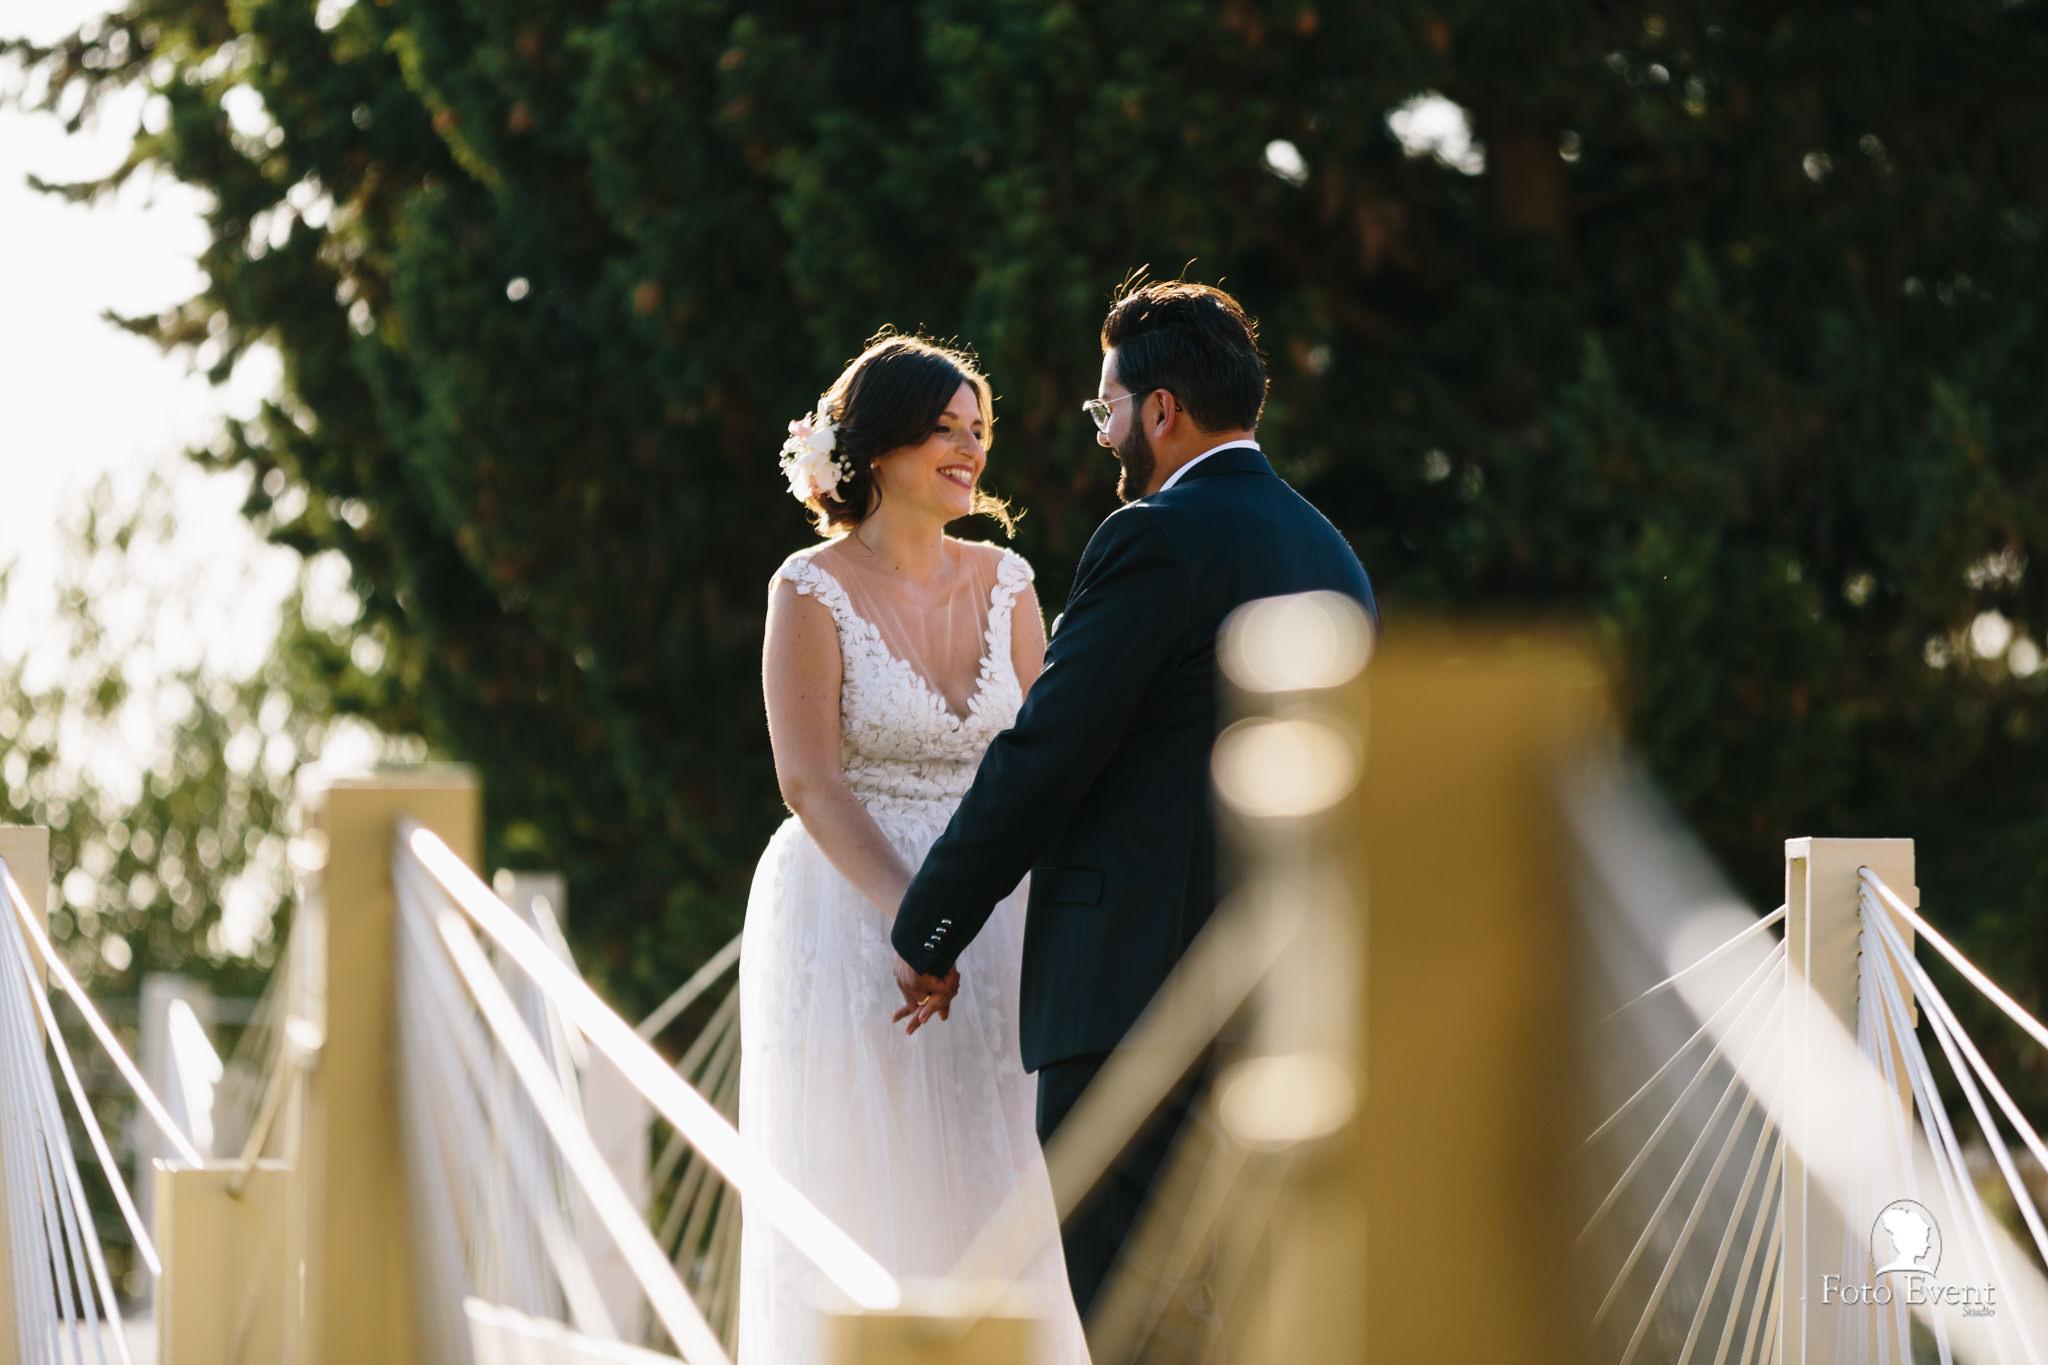 026-2019-09-09-Matrimonio-Dorotea-e-Alberto-Iemmolo-zoom-375